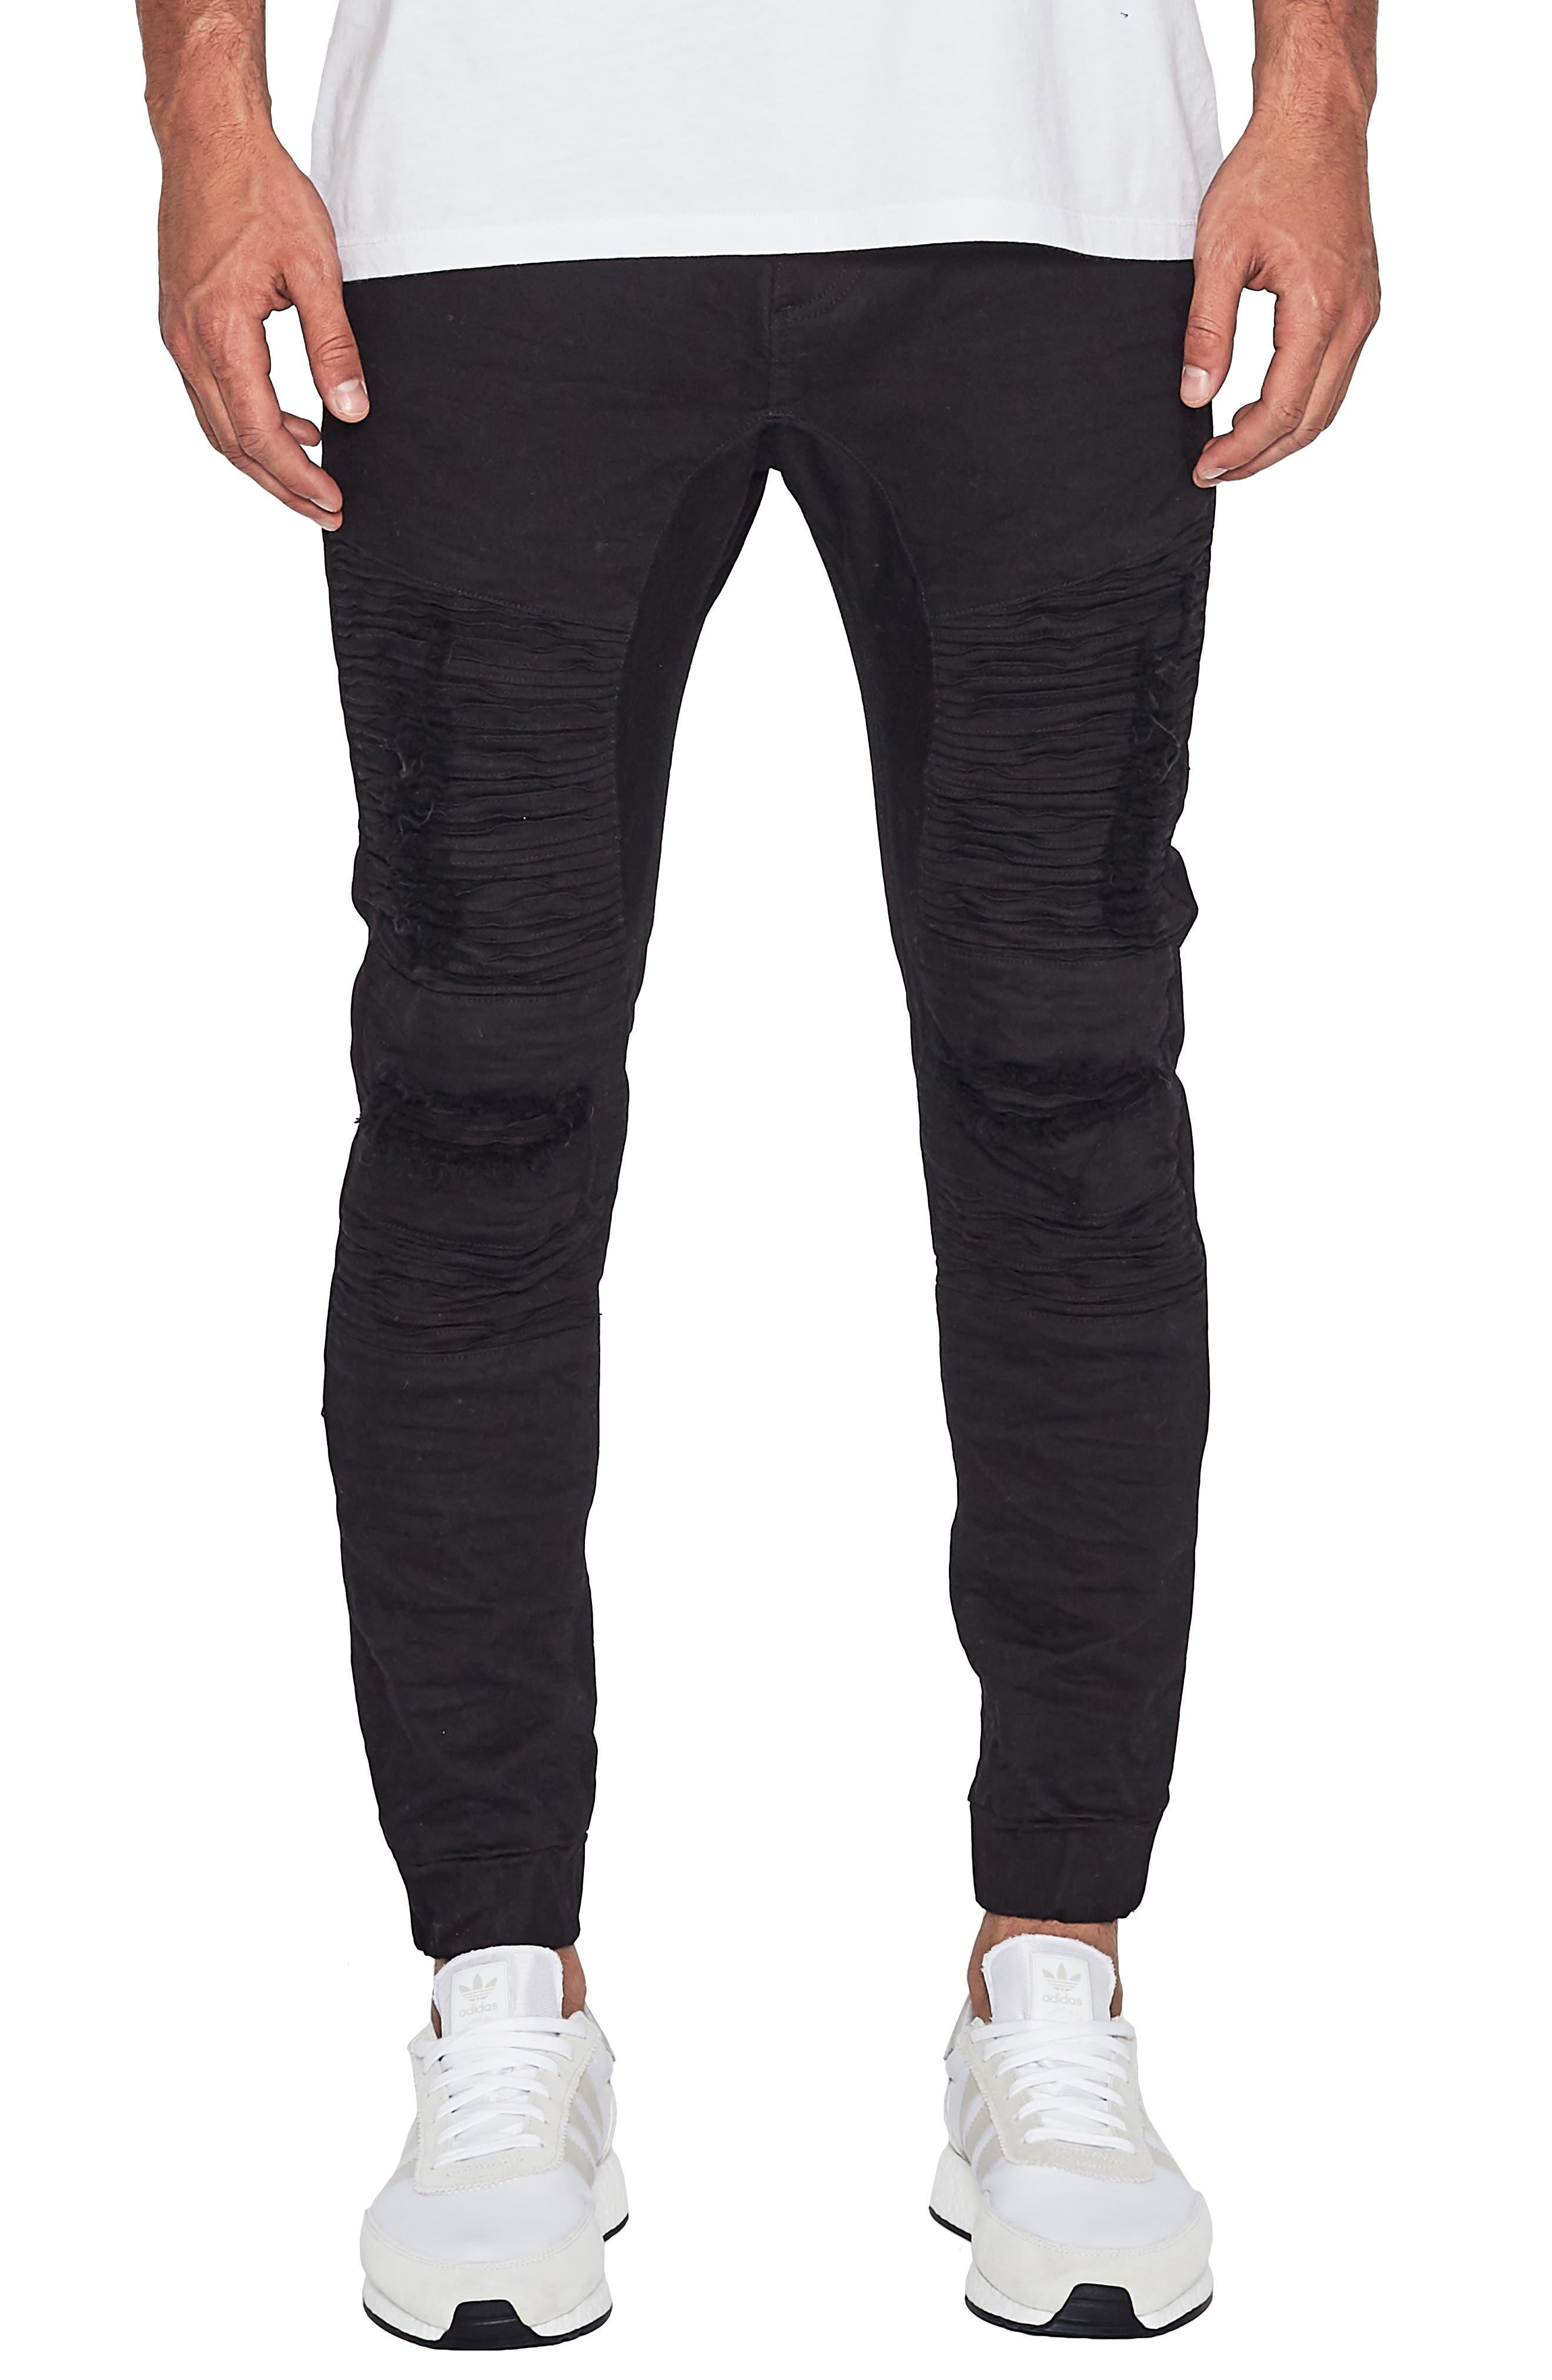 Hellcat Slim Fit Pants,                         Main,                         color, 001